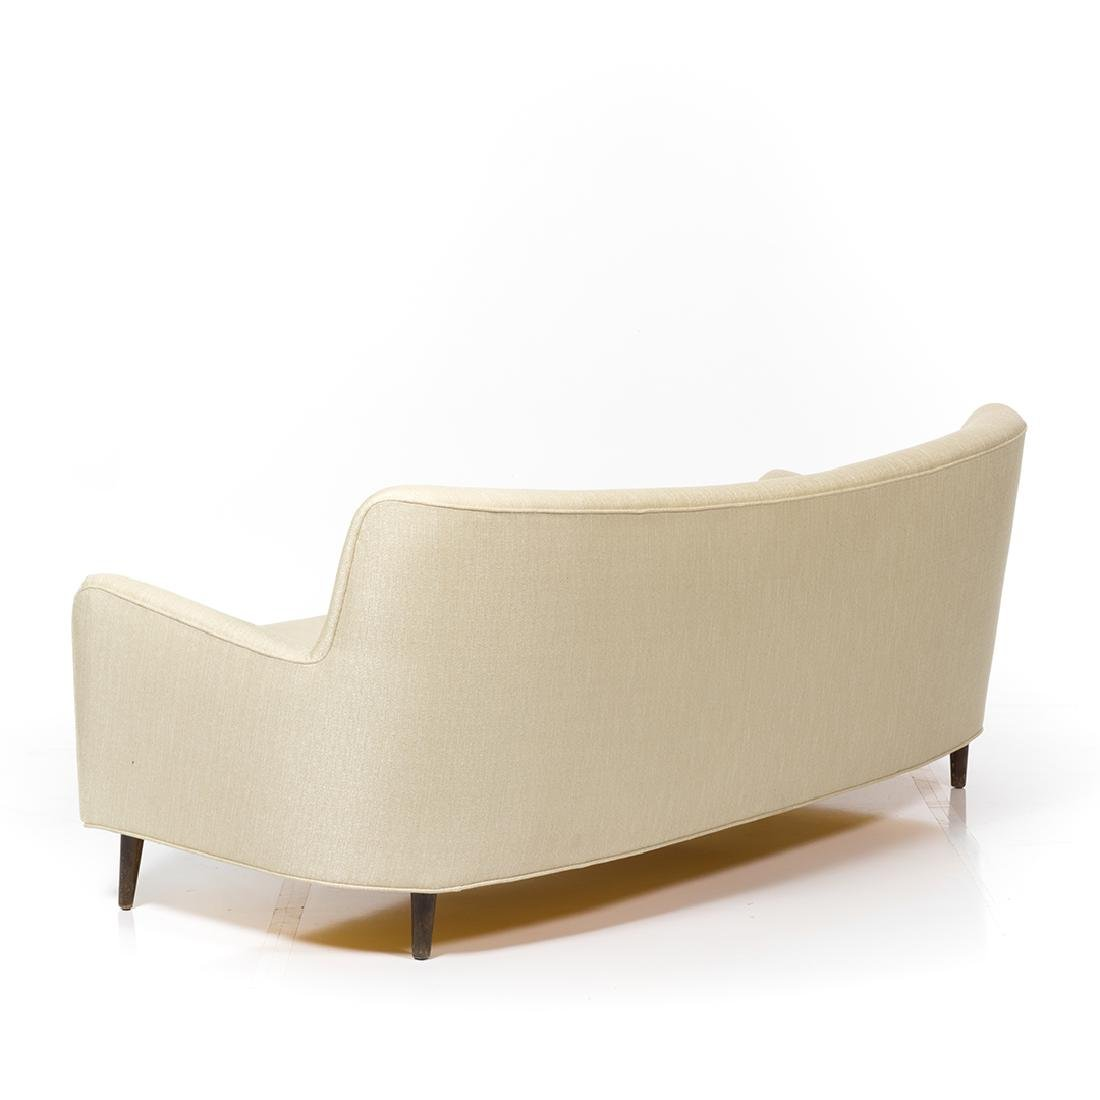 Gio Ponti Style Sofa - 3